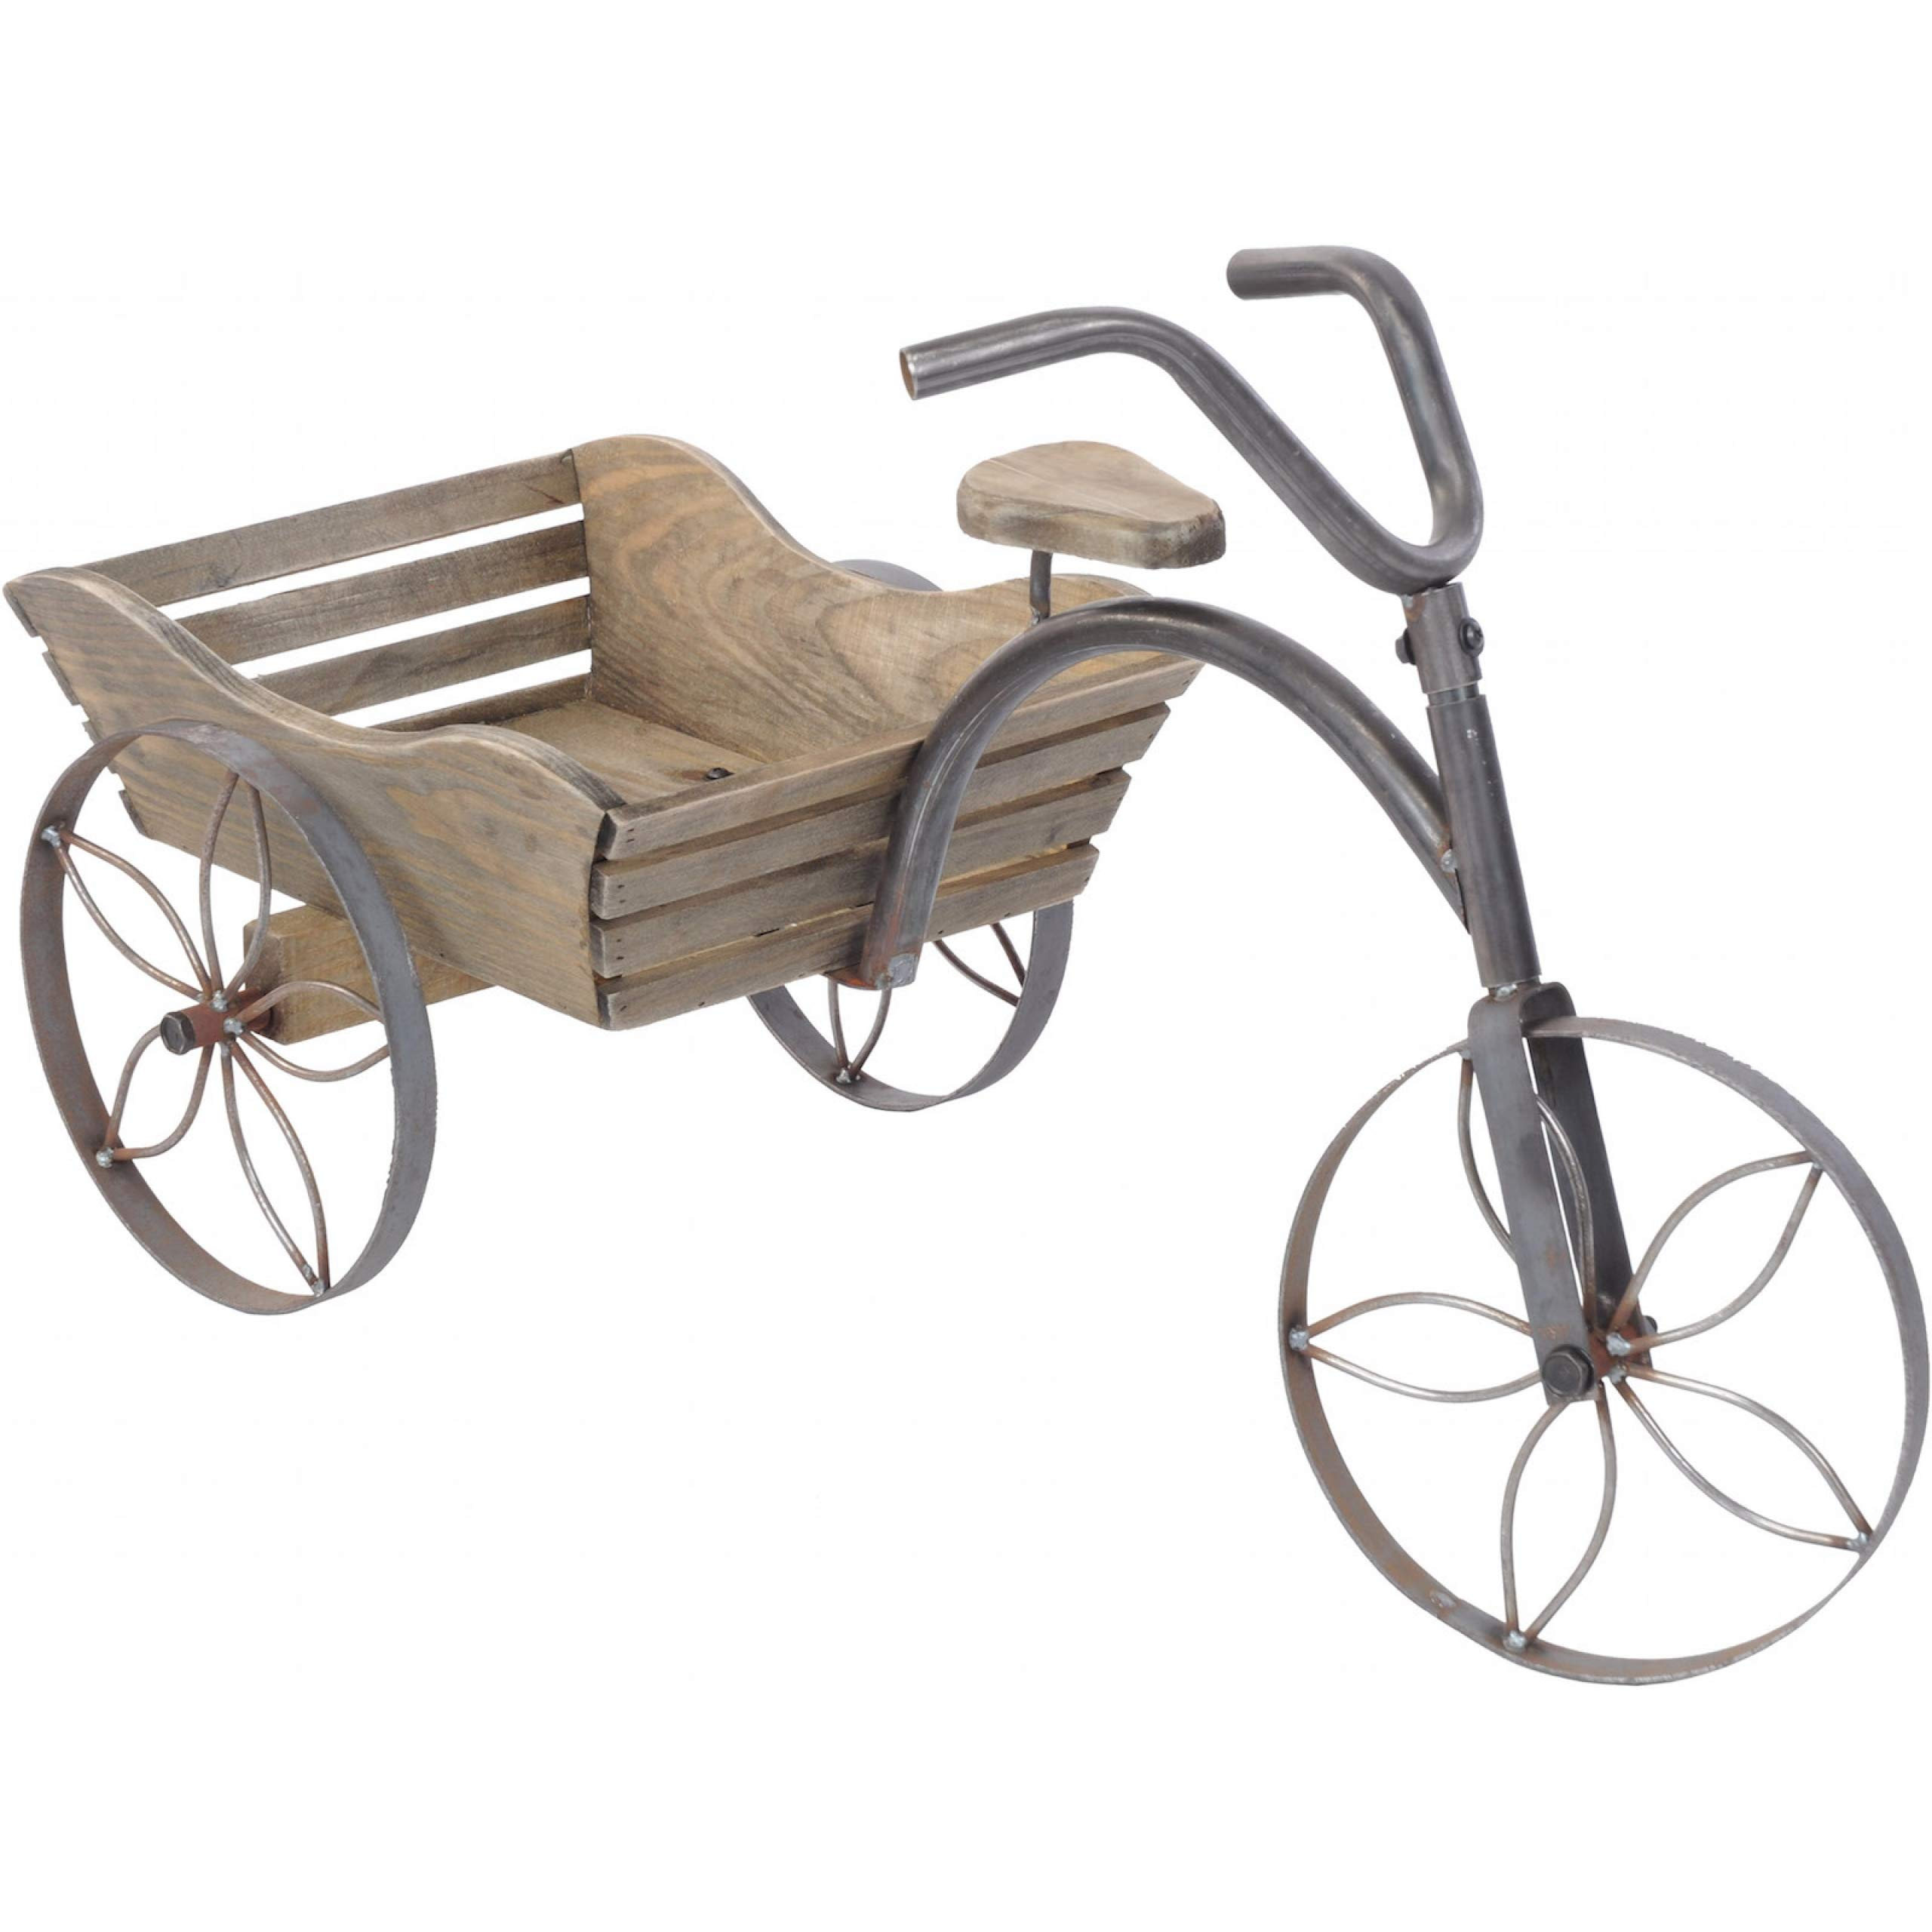 Bicicleta de madera decoración coche jardín plantas bicicleta ...